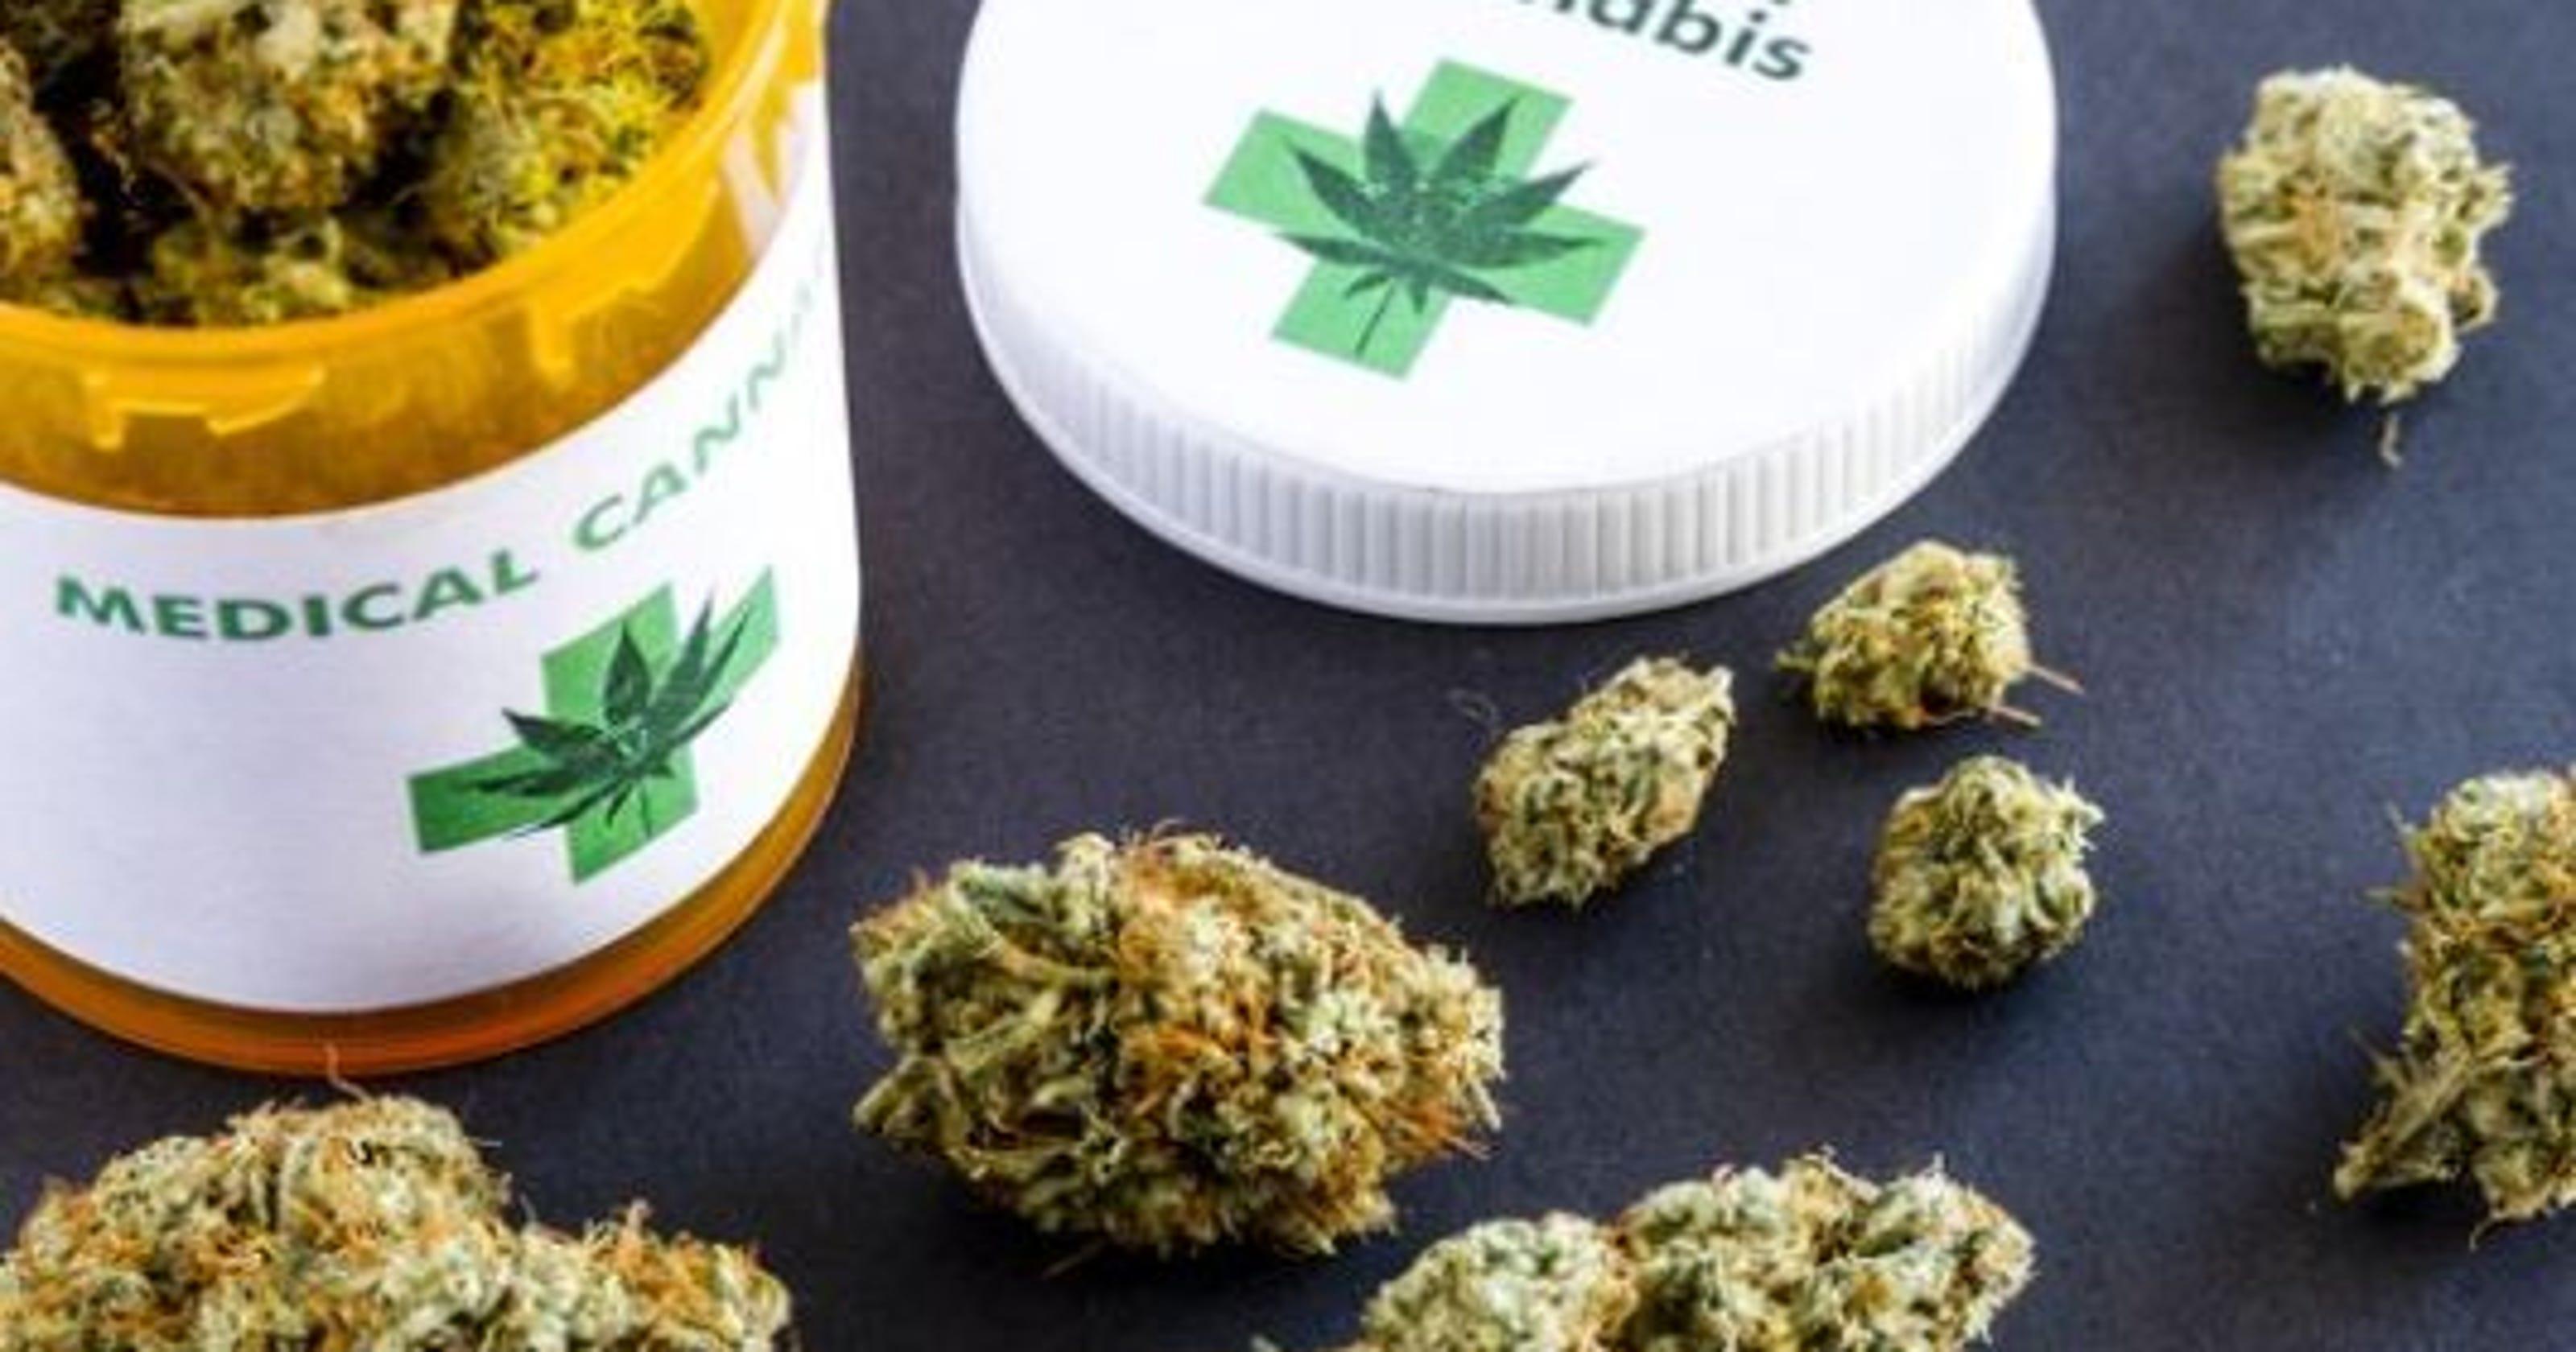 RISE York, a medical marijuana dispensary, to open Oct  2 in